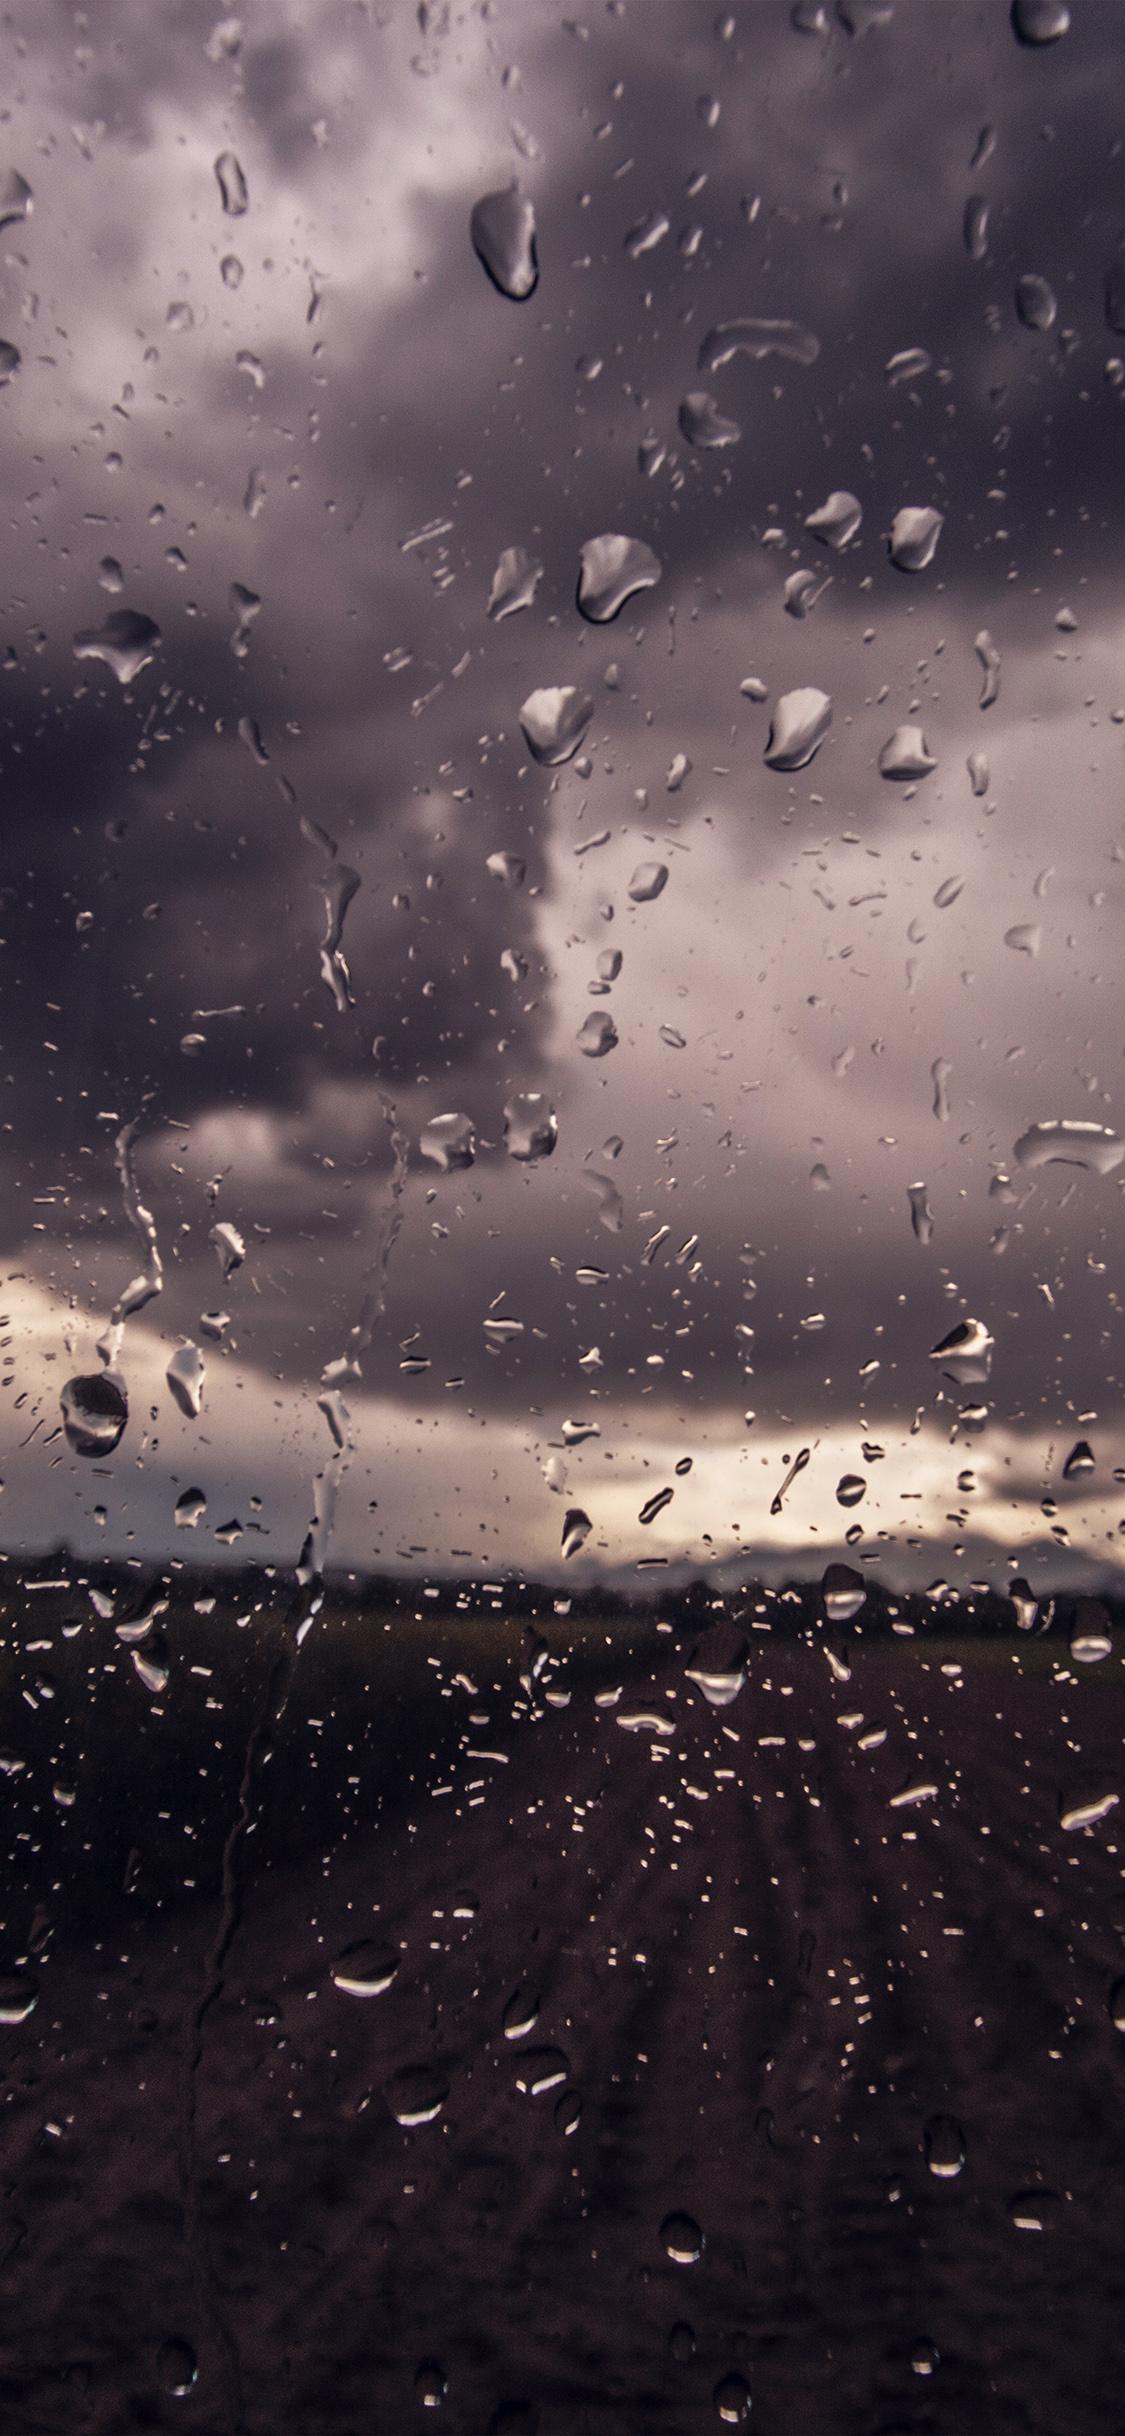 iPhonexpapers.com-Apple-iPhone-wallpaper-mv91-rainy-window-nature-water-drop-road-blue